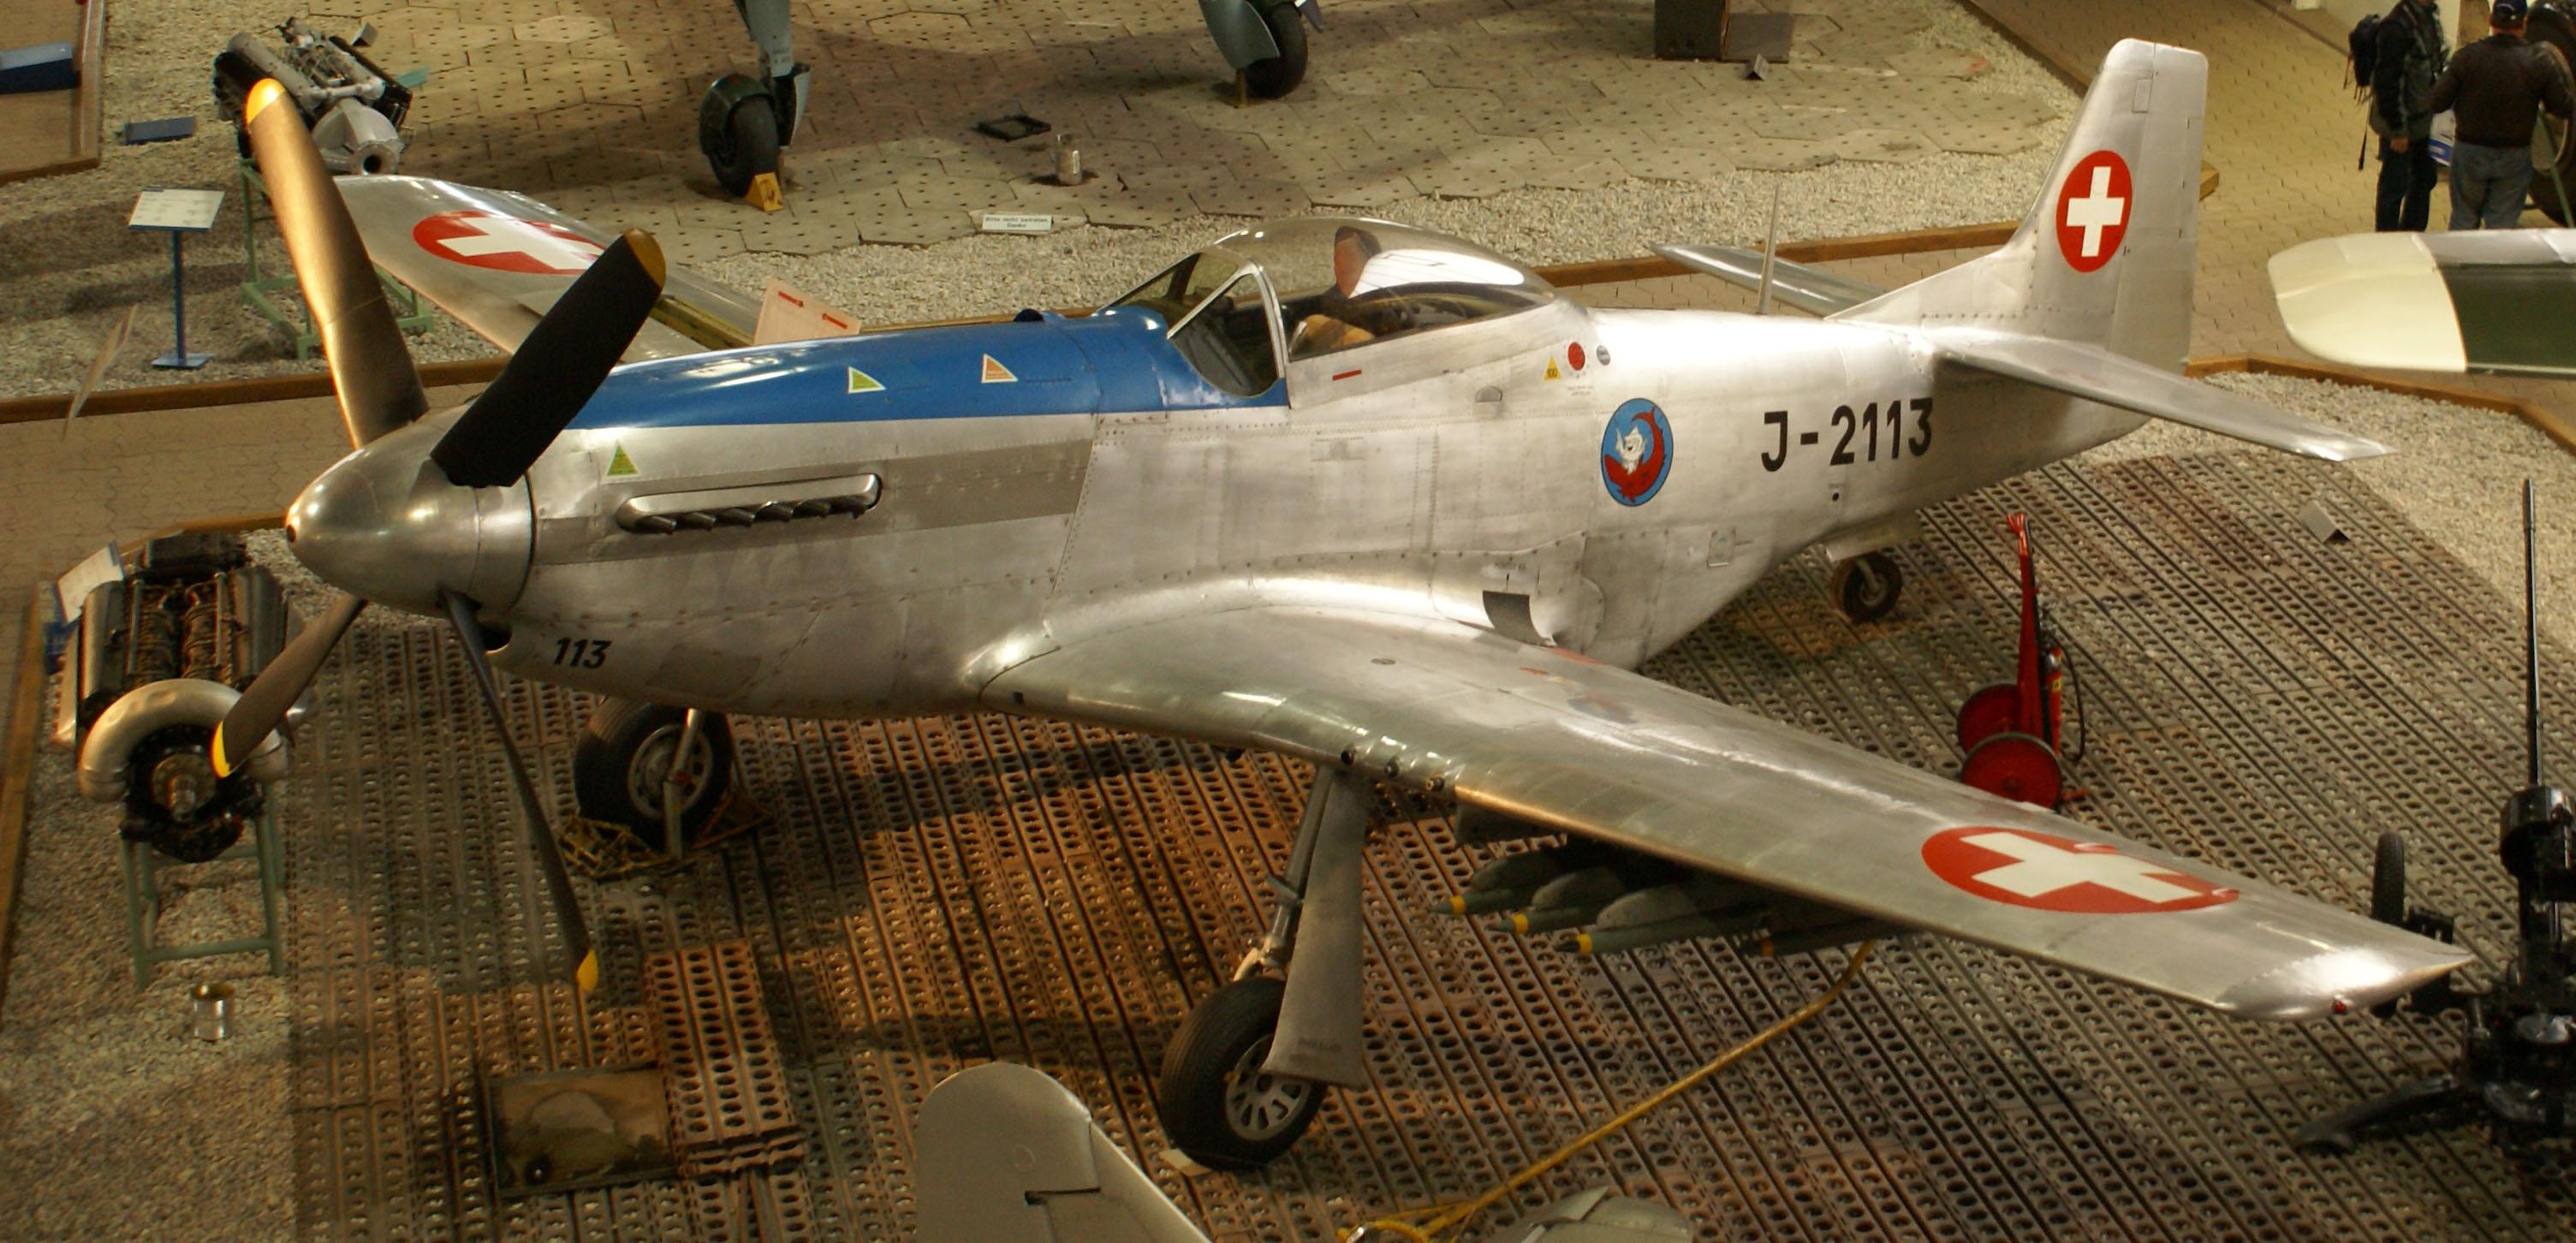 North American P-51 Mustang variants